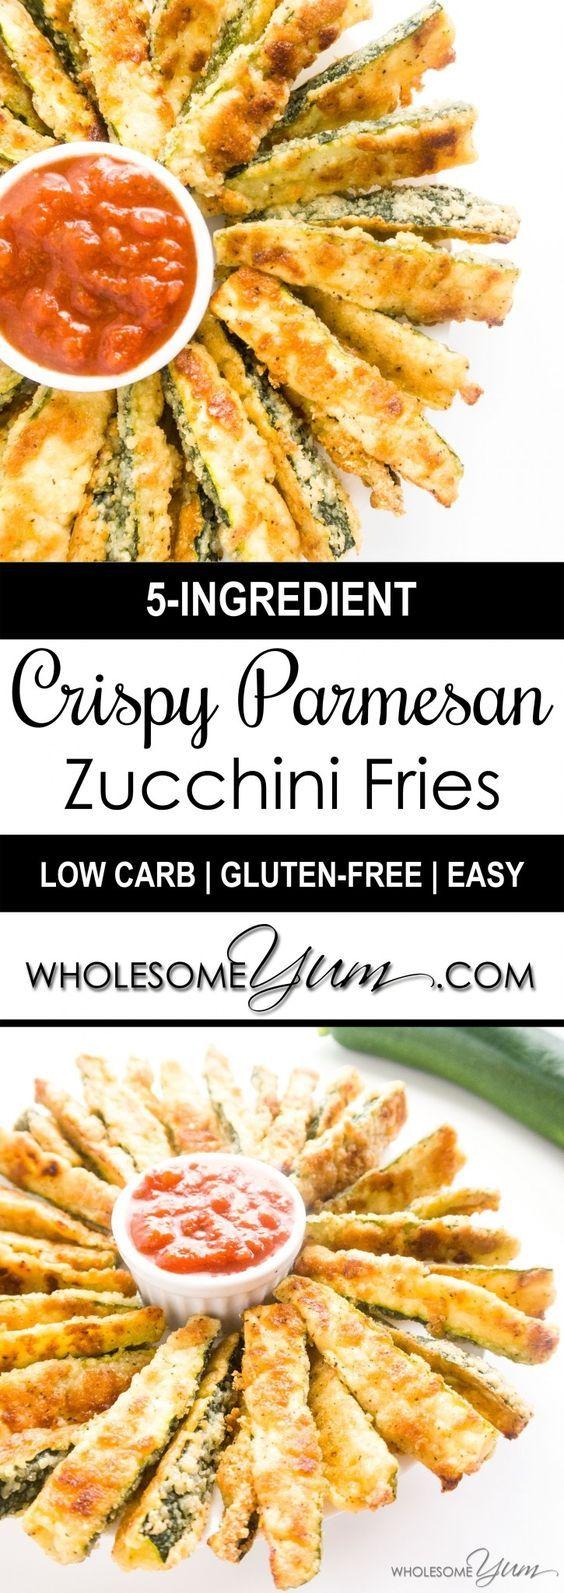 Crispy Parmesan Zucchini Fries (Low Carb, Gluten-free)